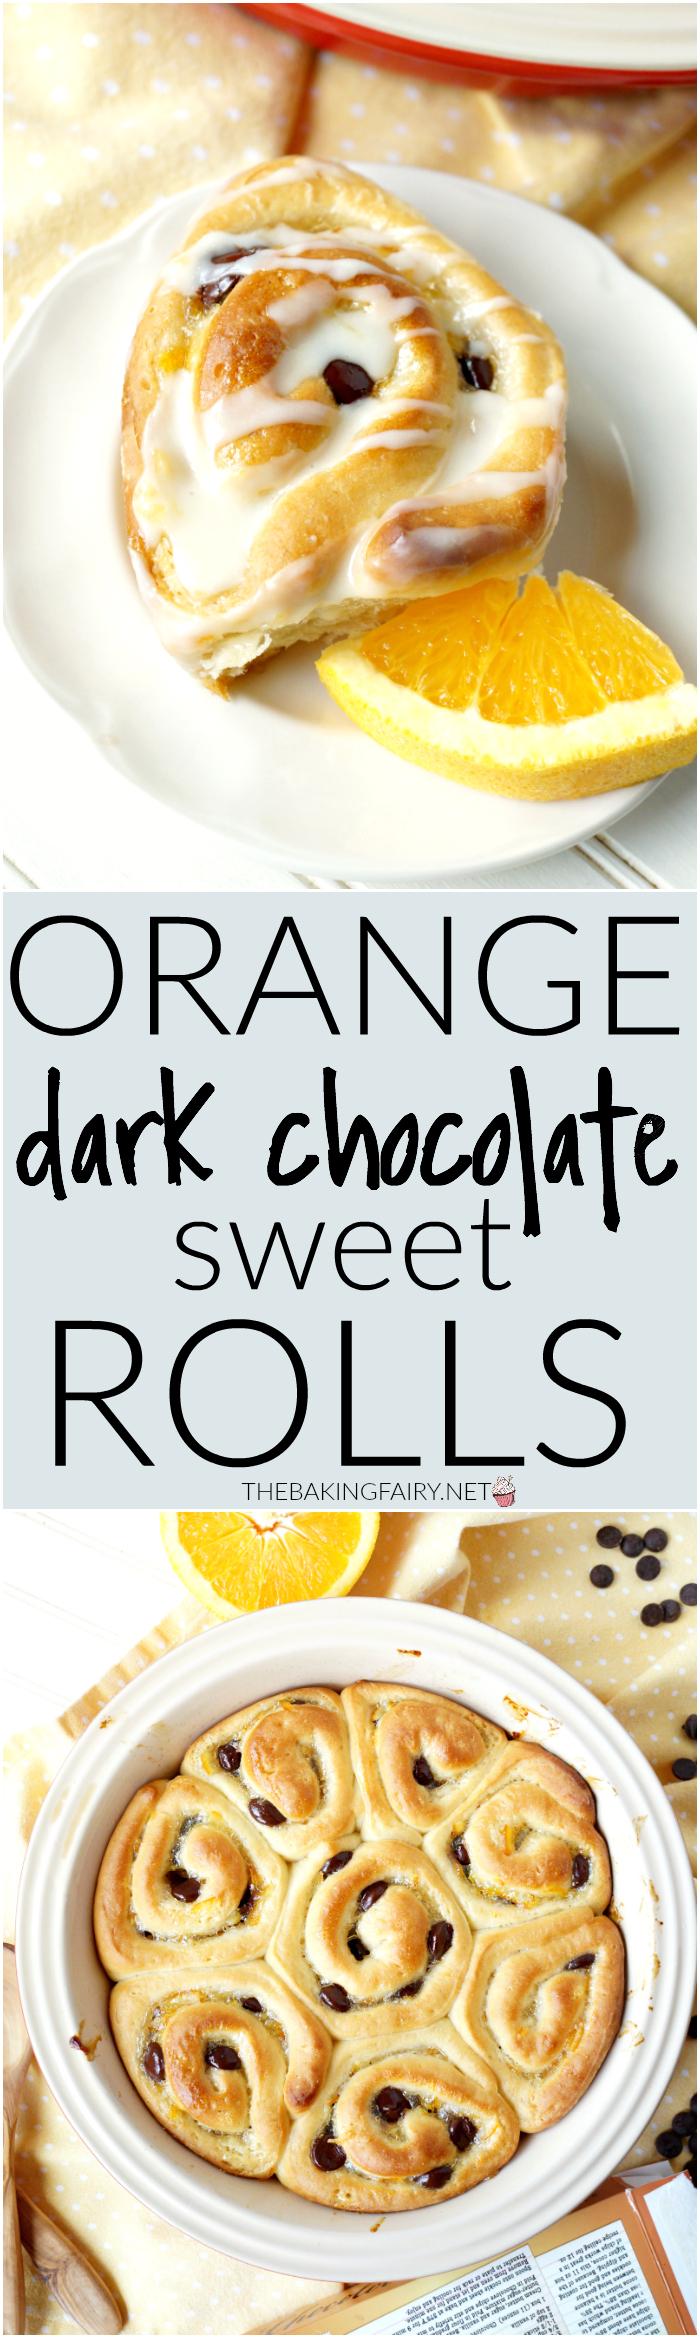 orange dark chocolate sweet rolls | The Baking Fairy